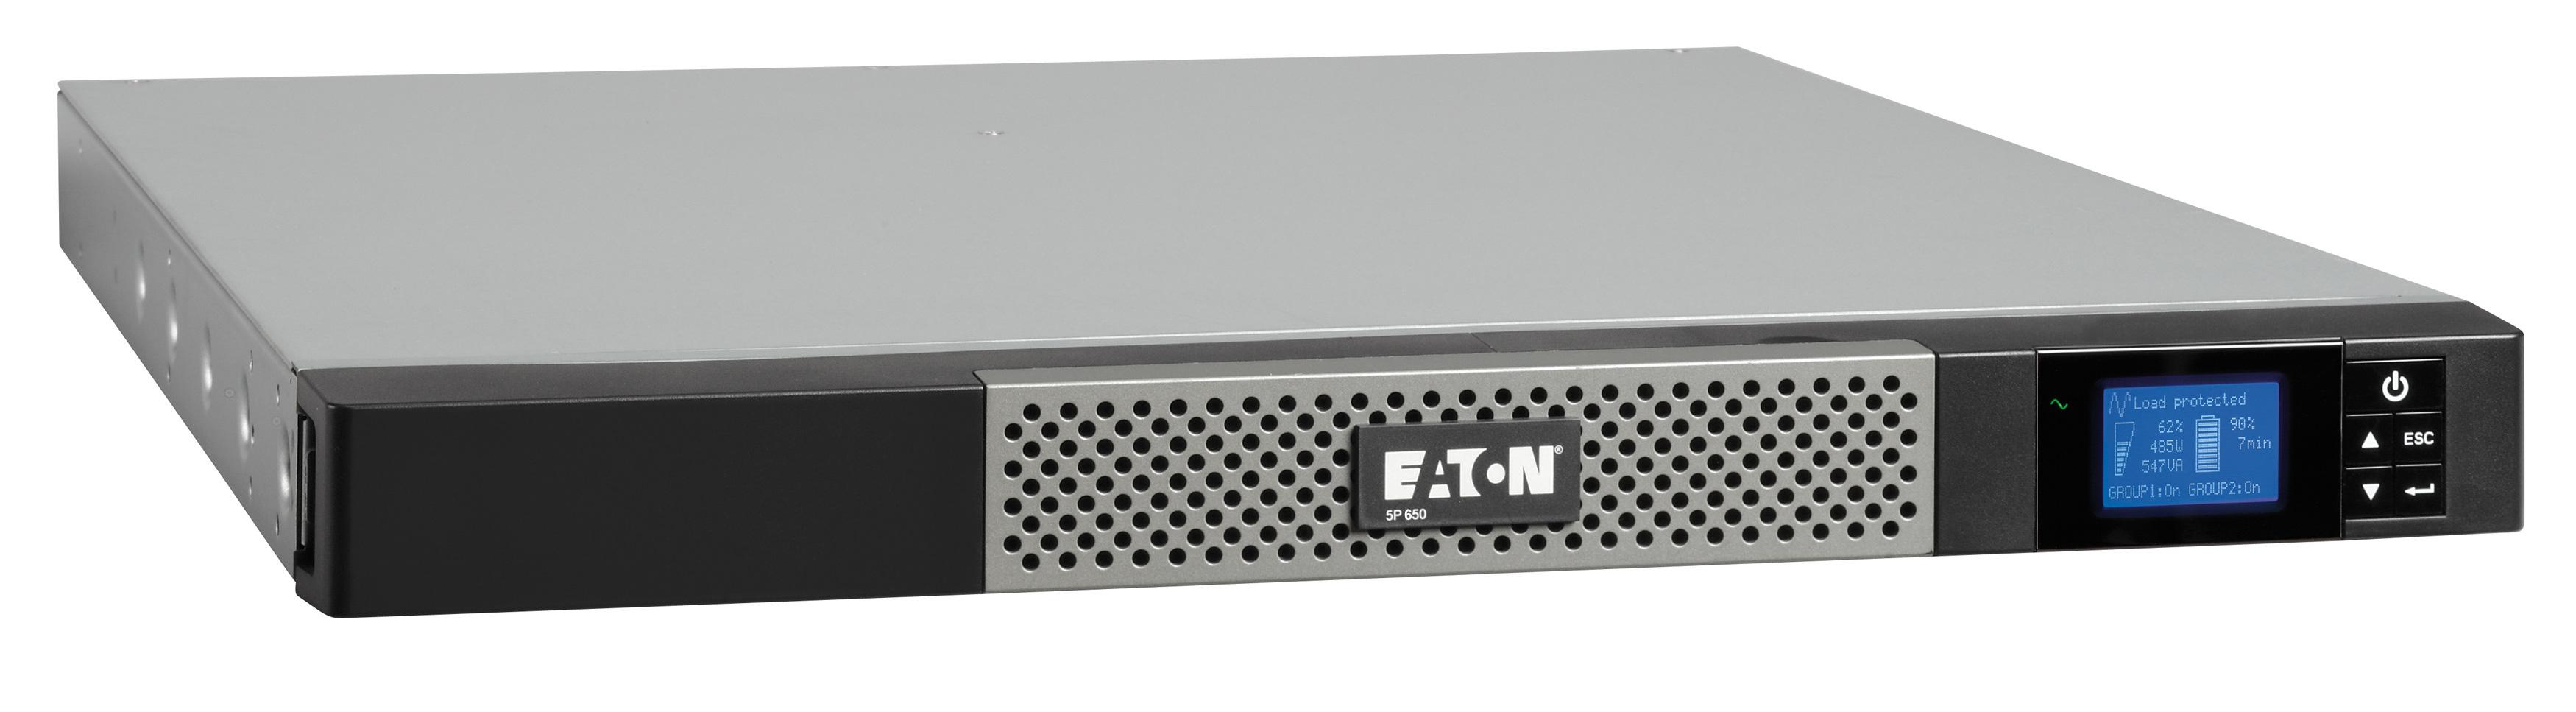 ИБП Eaton 5P 650i Rack1U